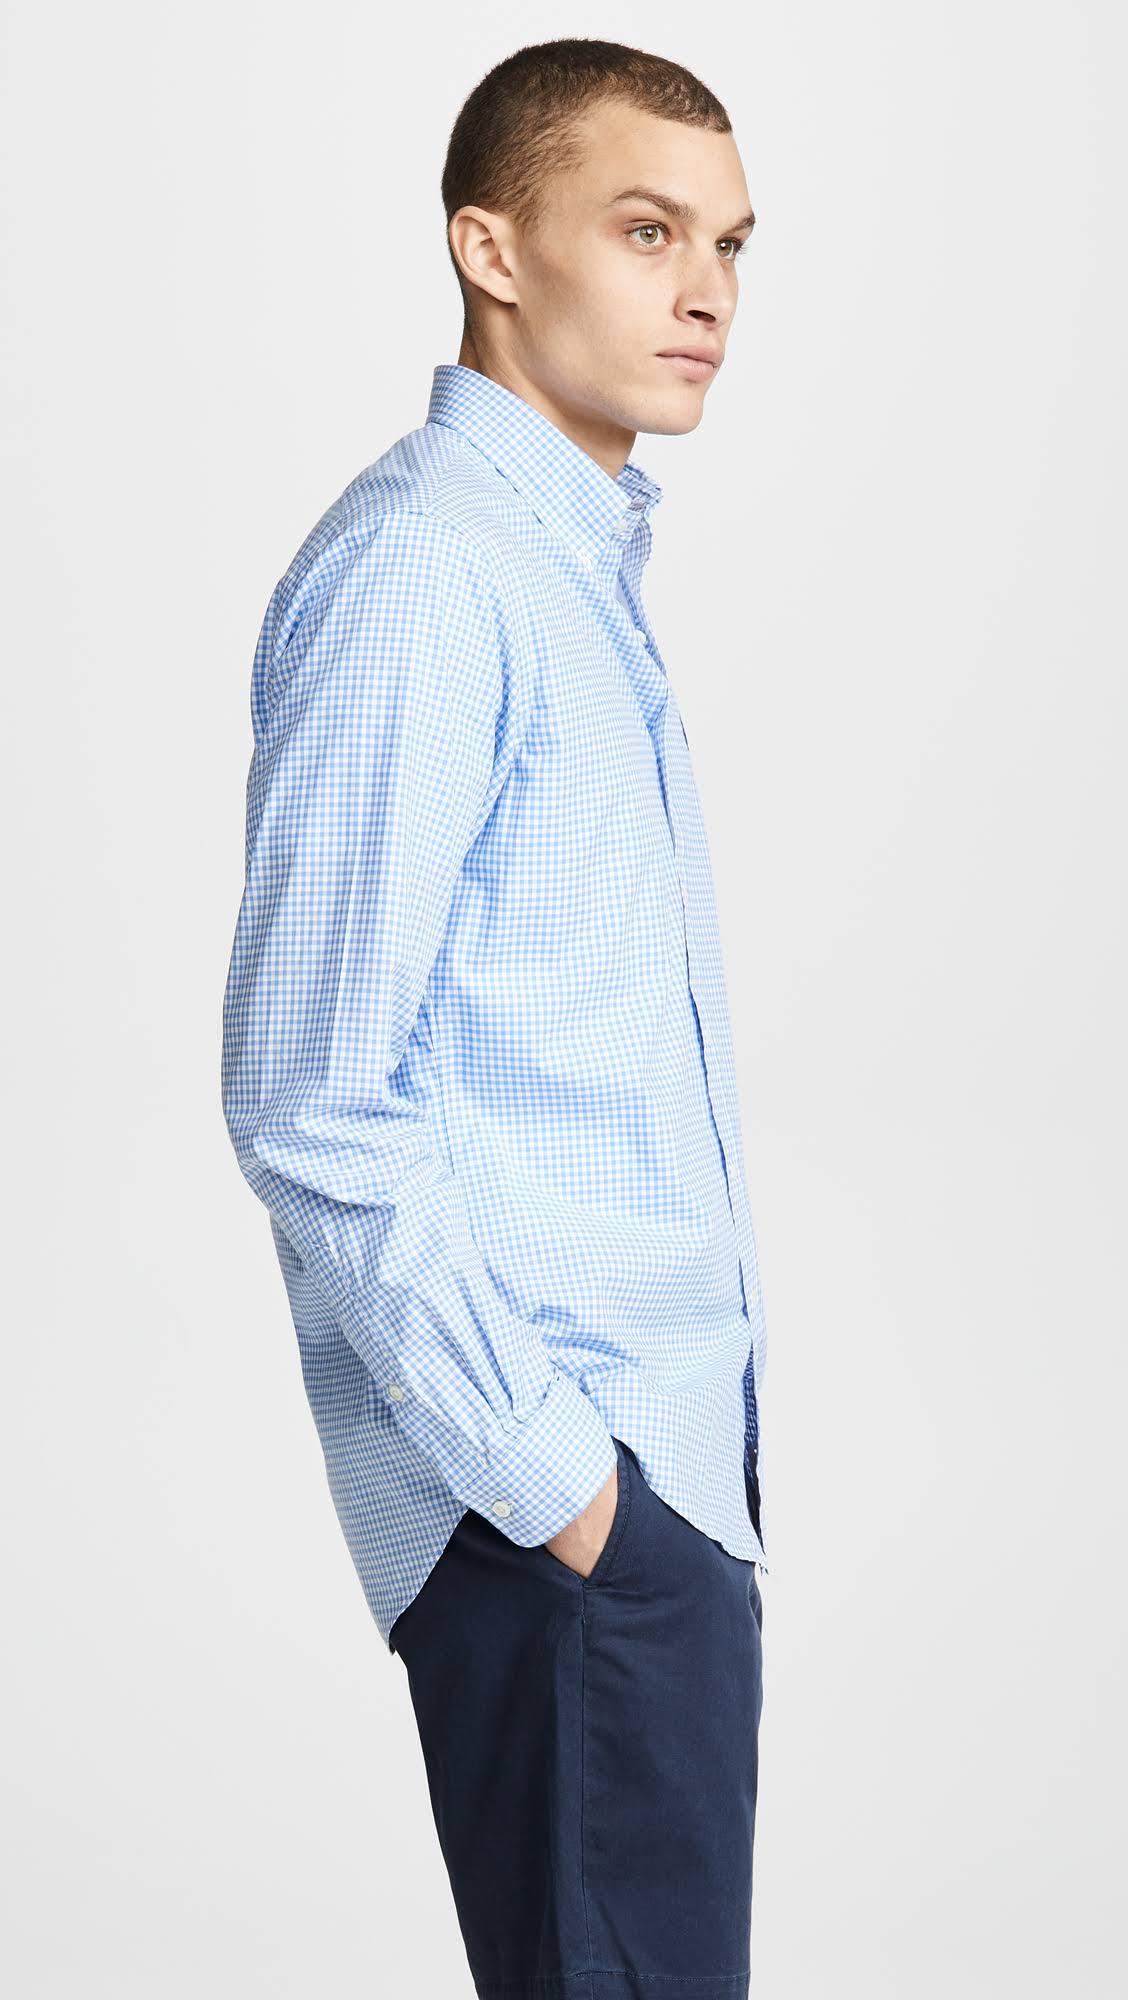 Polo Con Ralph Poplin Ajustada Azul Camisa Botones Lauren TSTX4BqHr